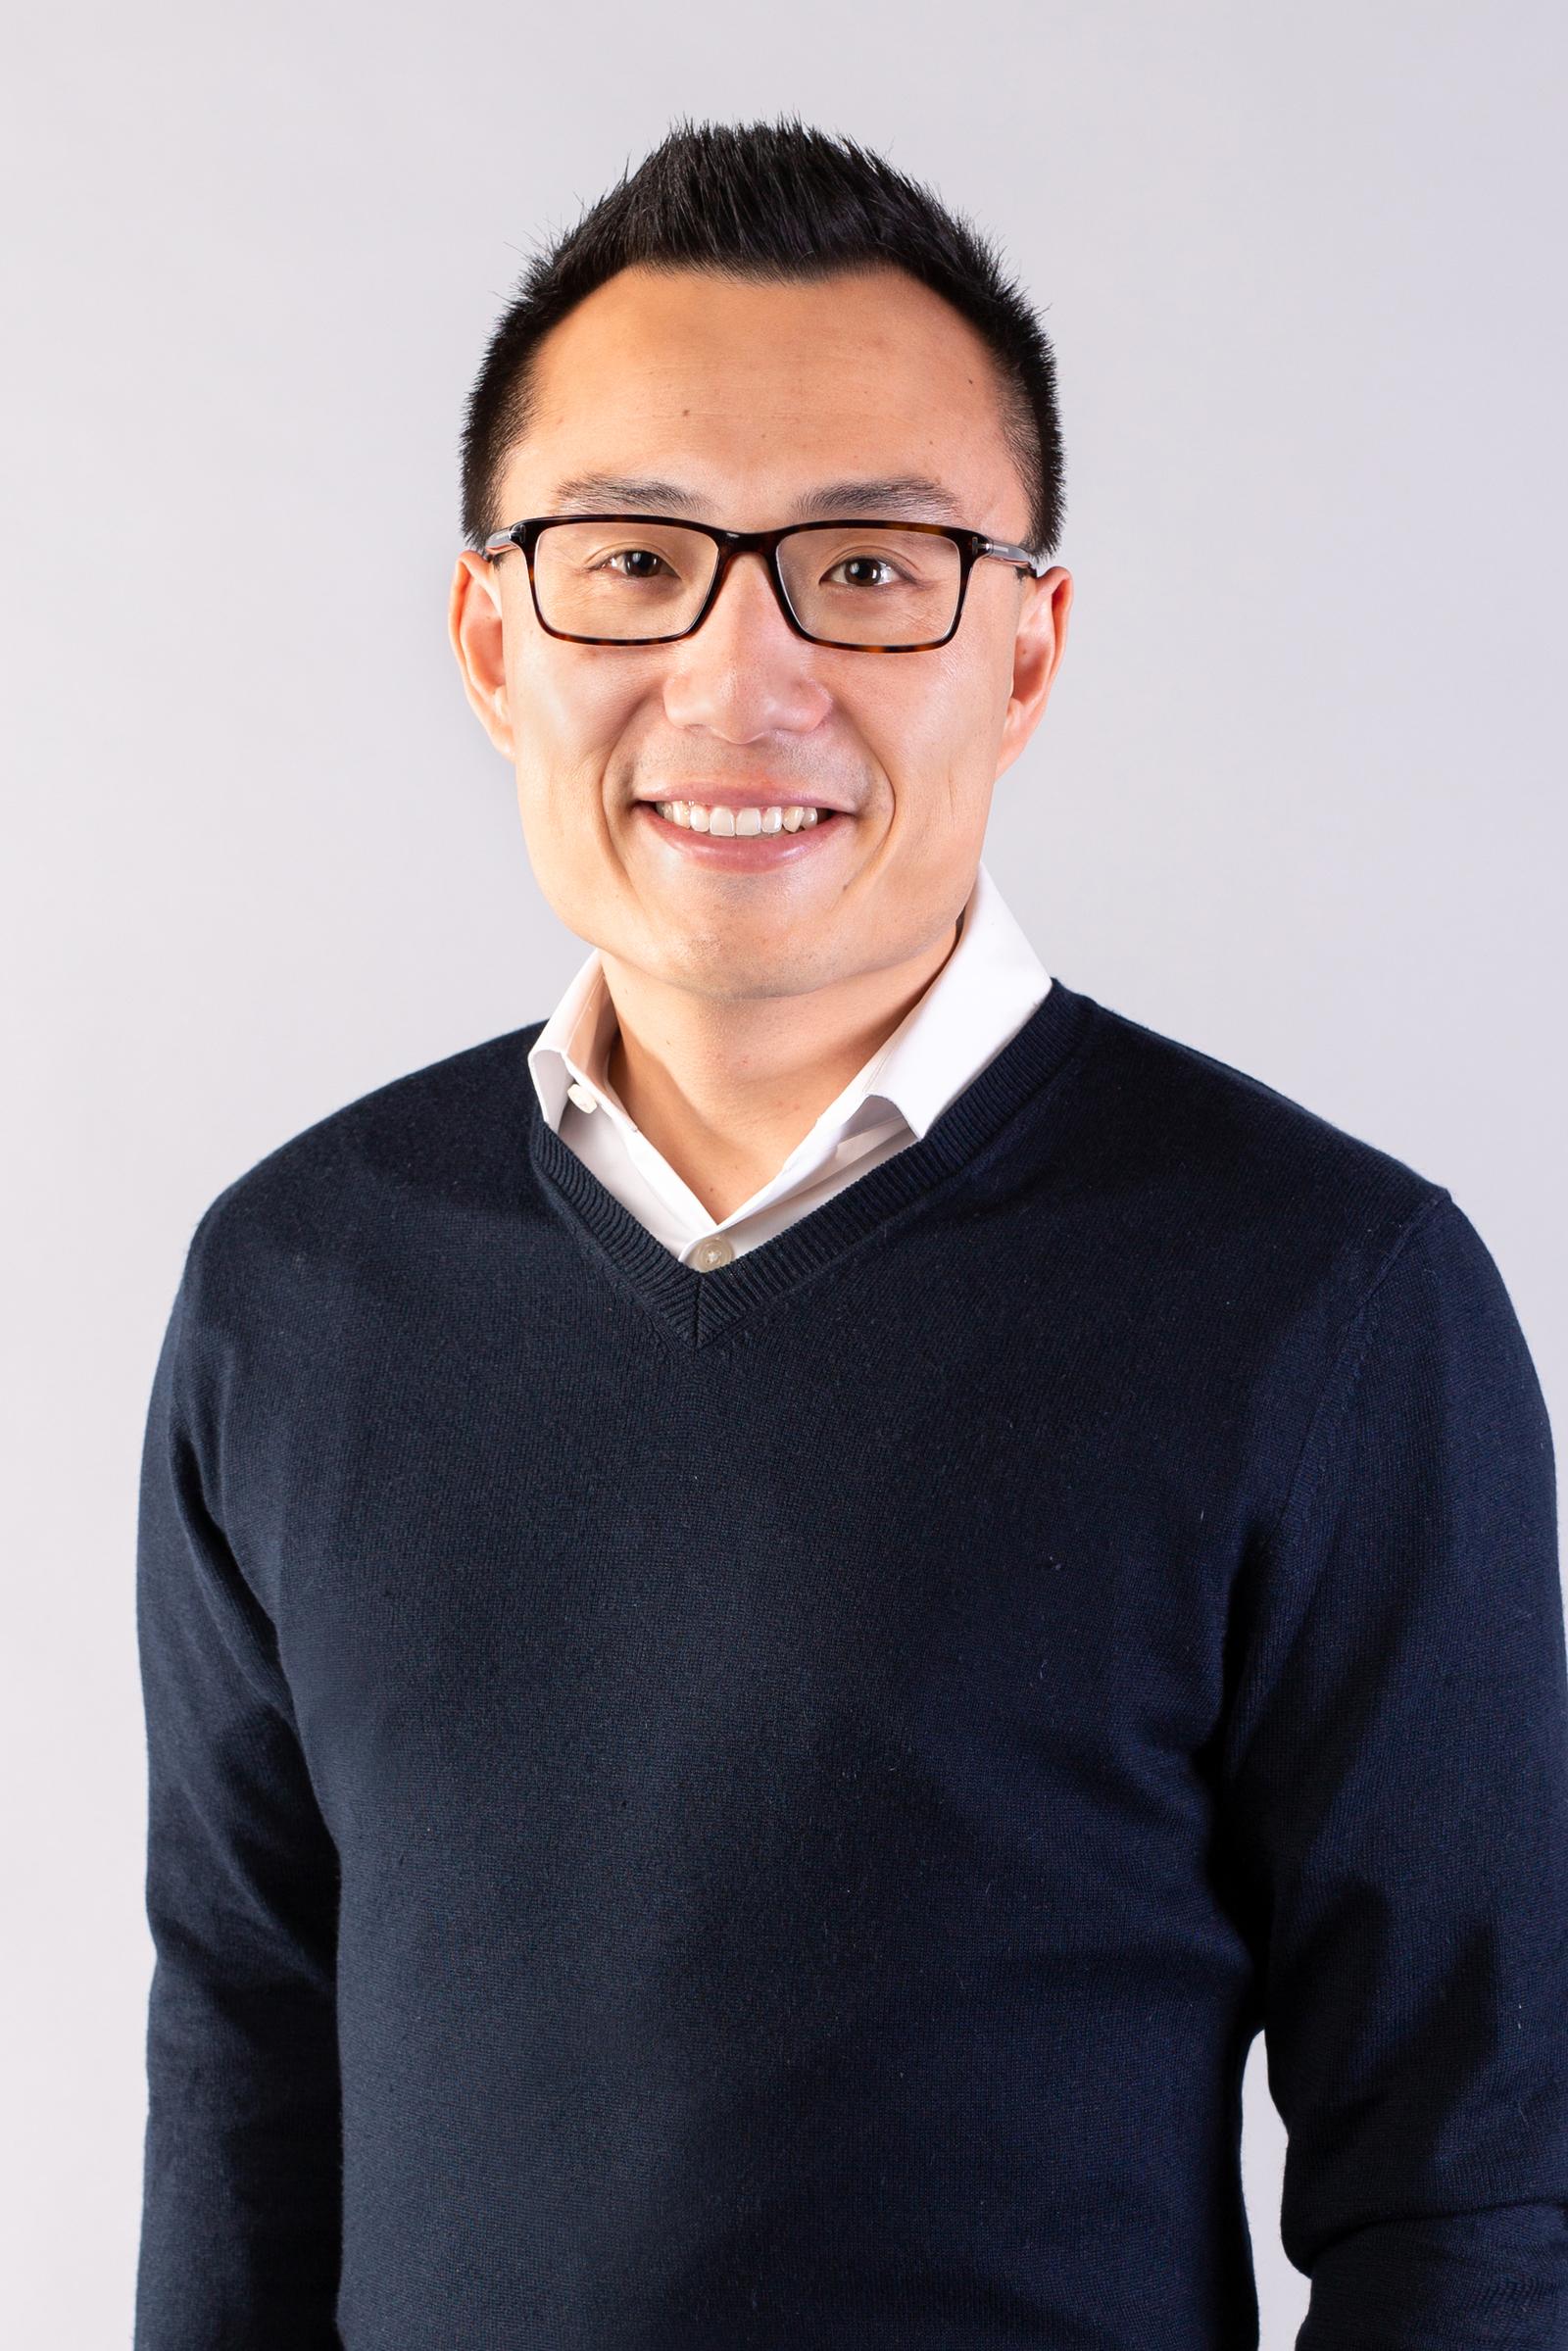 A photo of Tony Xu who is CEO of DoorDash